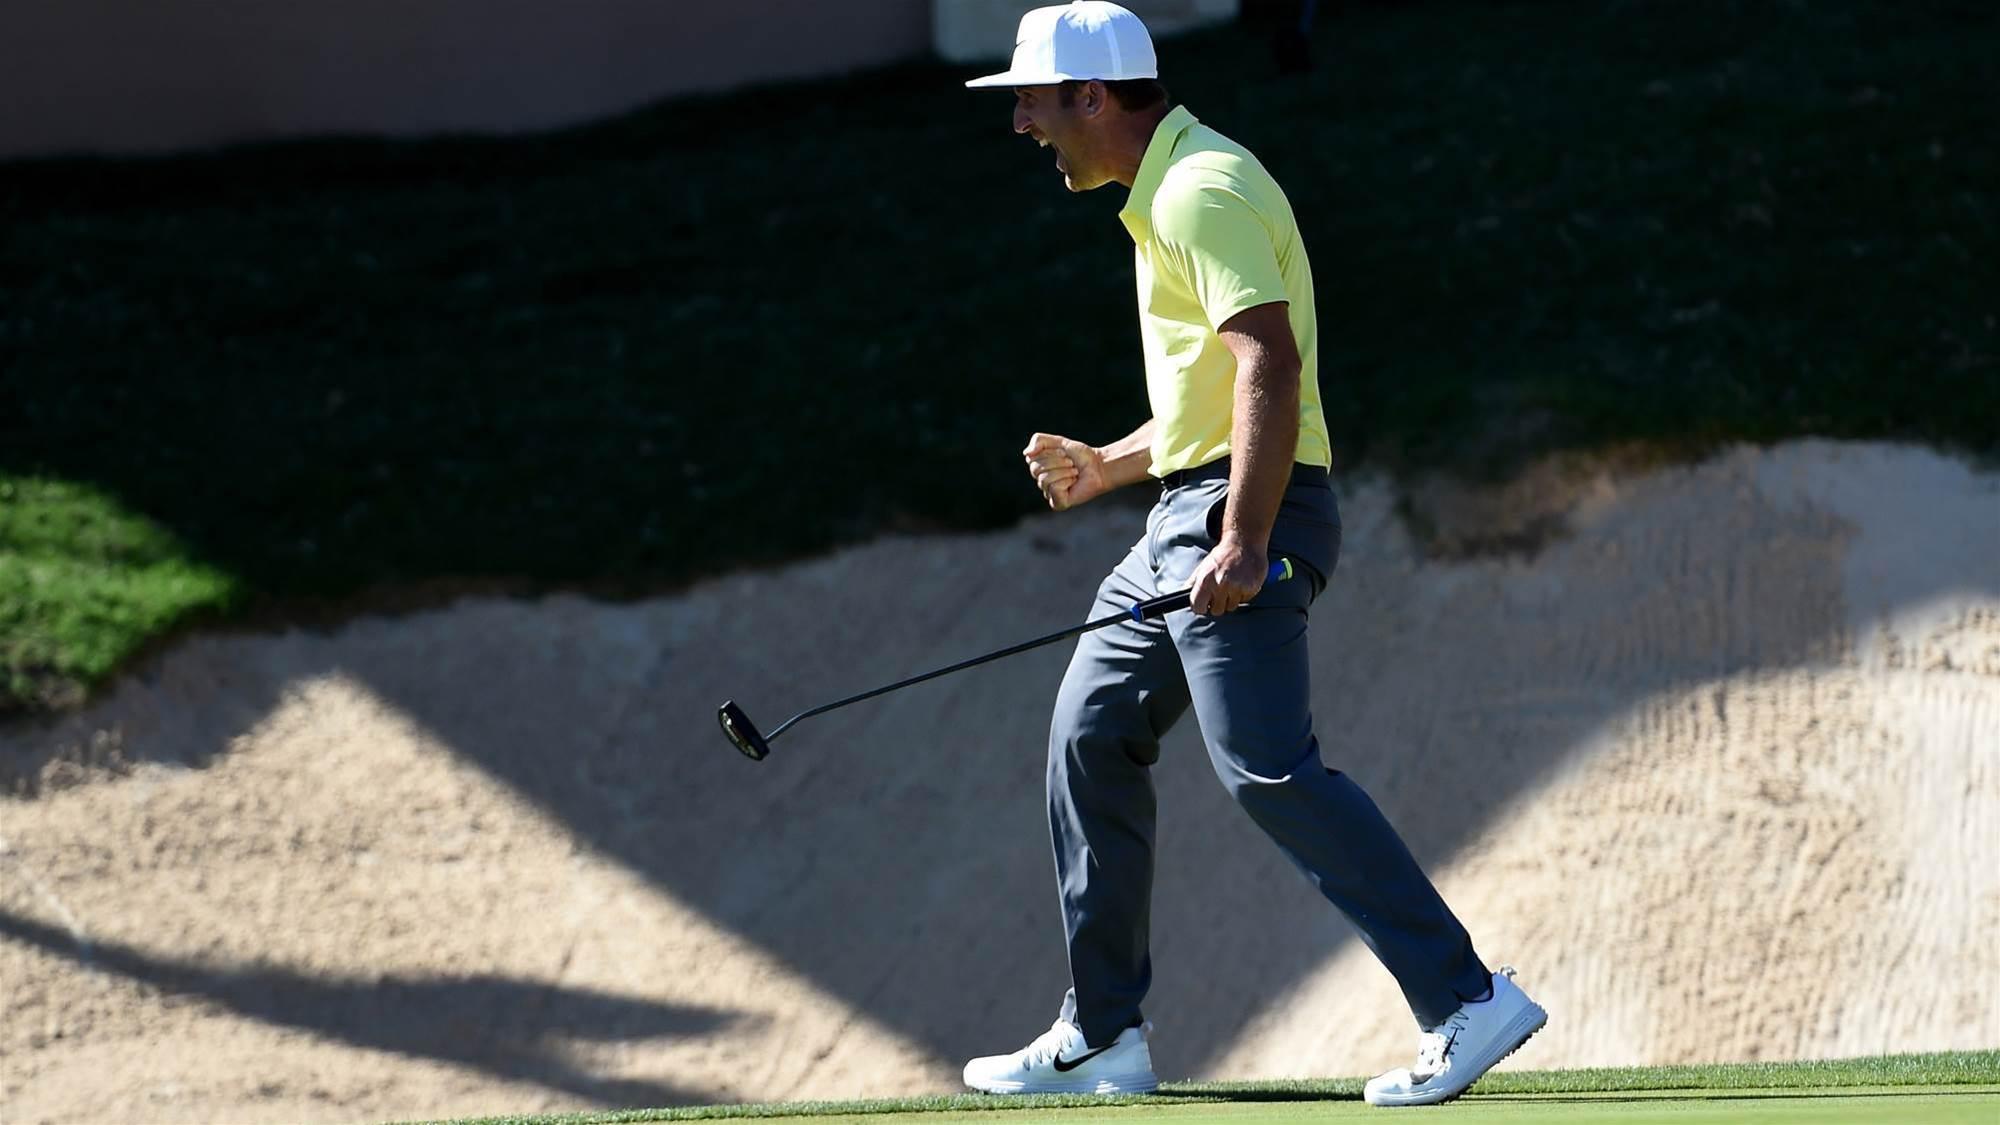 PGA TOUR: Chappell breaks his duck